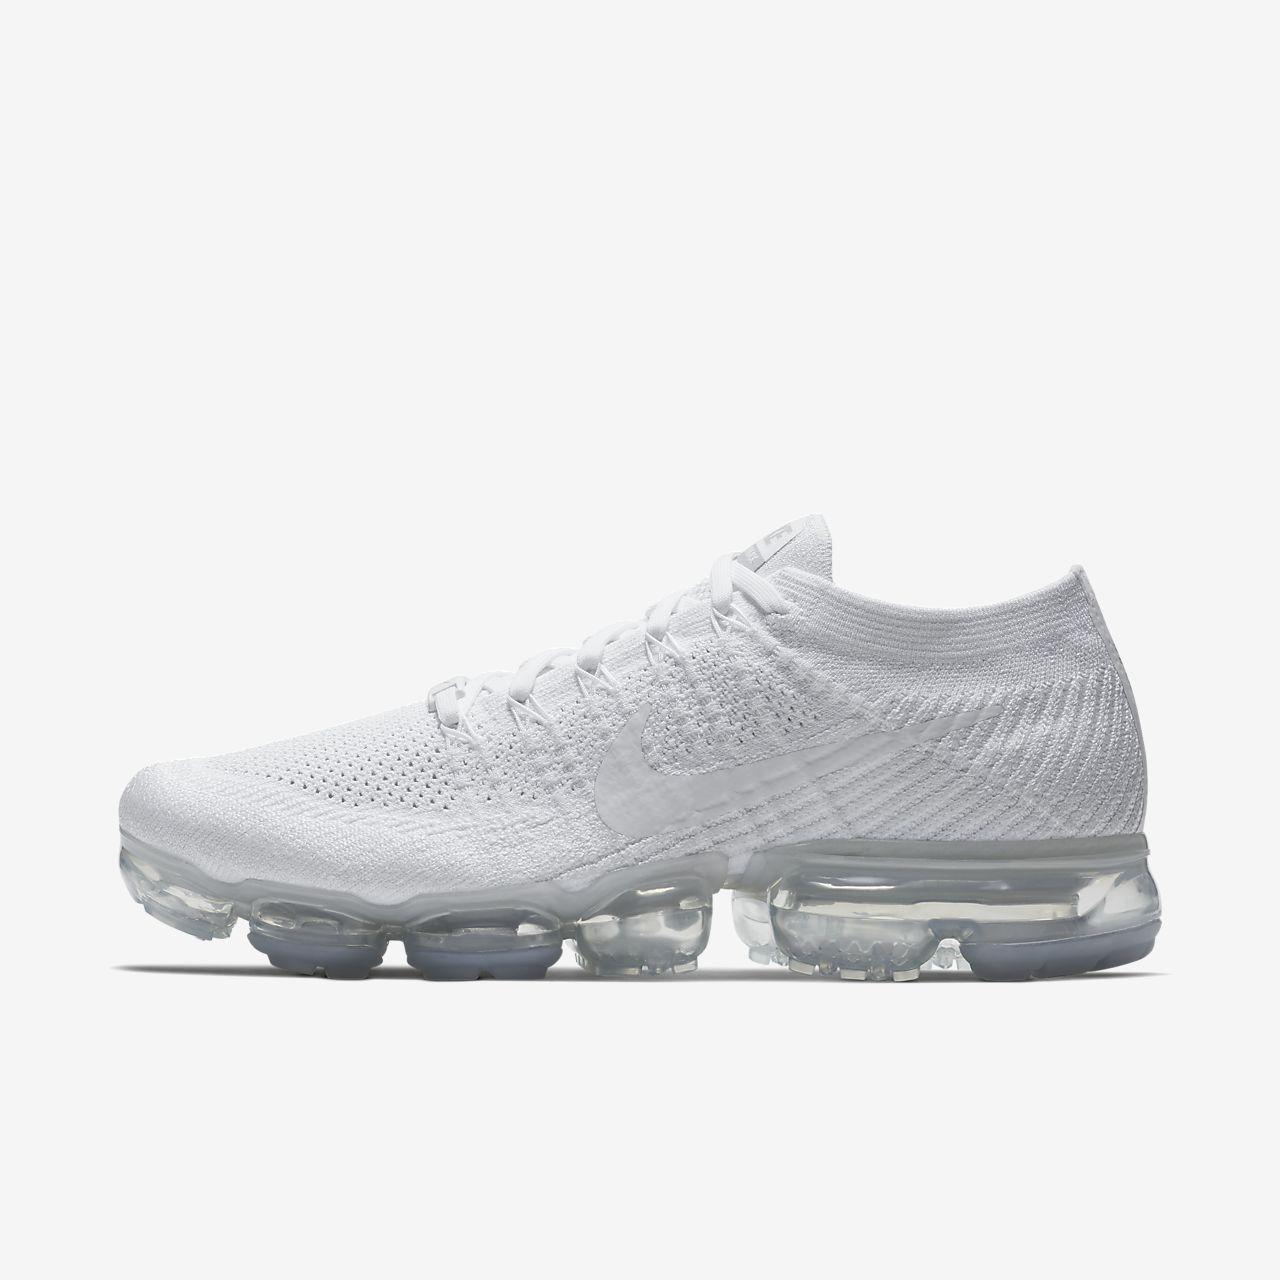 Pour De Air Chaussure Vapormax HommeBe Running Flyknit Nike c4jRq3AL5